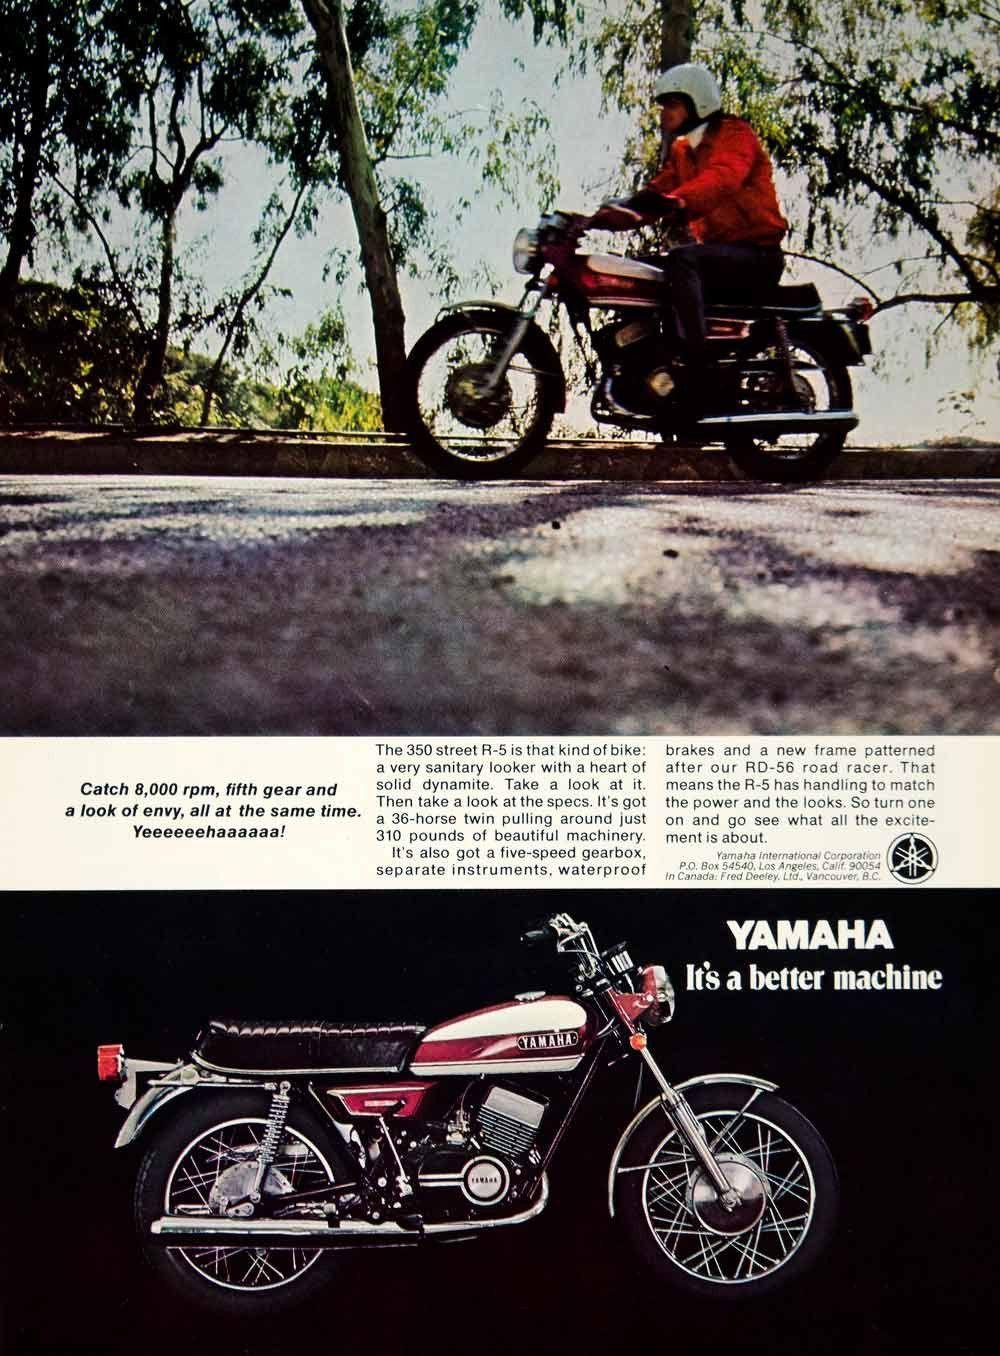 1970 Ad Yamaha R 5 Rd350 Classic Motorcycle Transportation Machine Bike Ycd8 Classic Motorcycles Yamaha Motorcycle